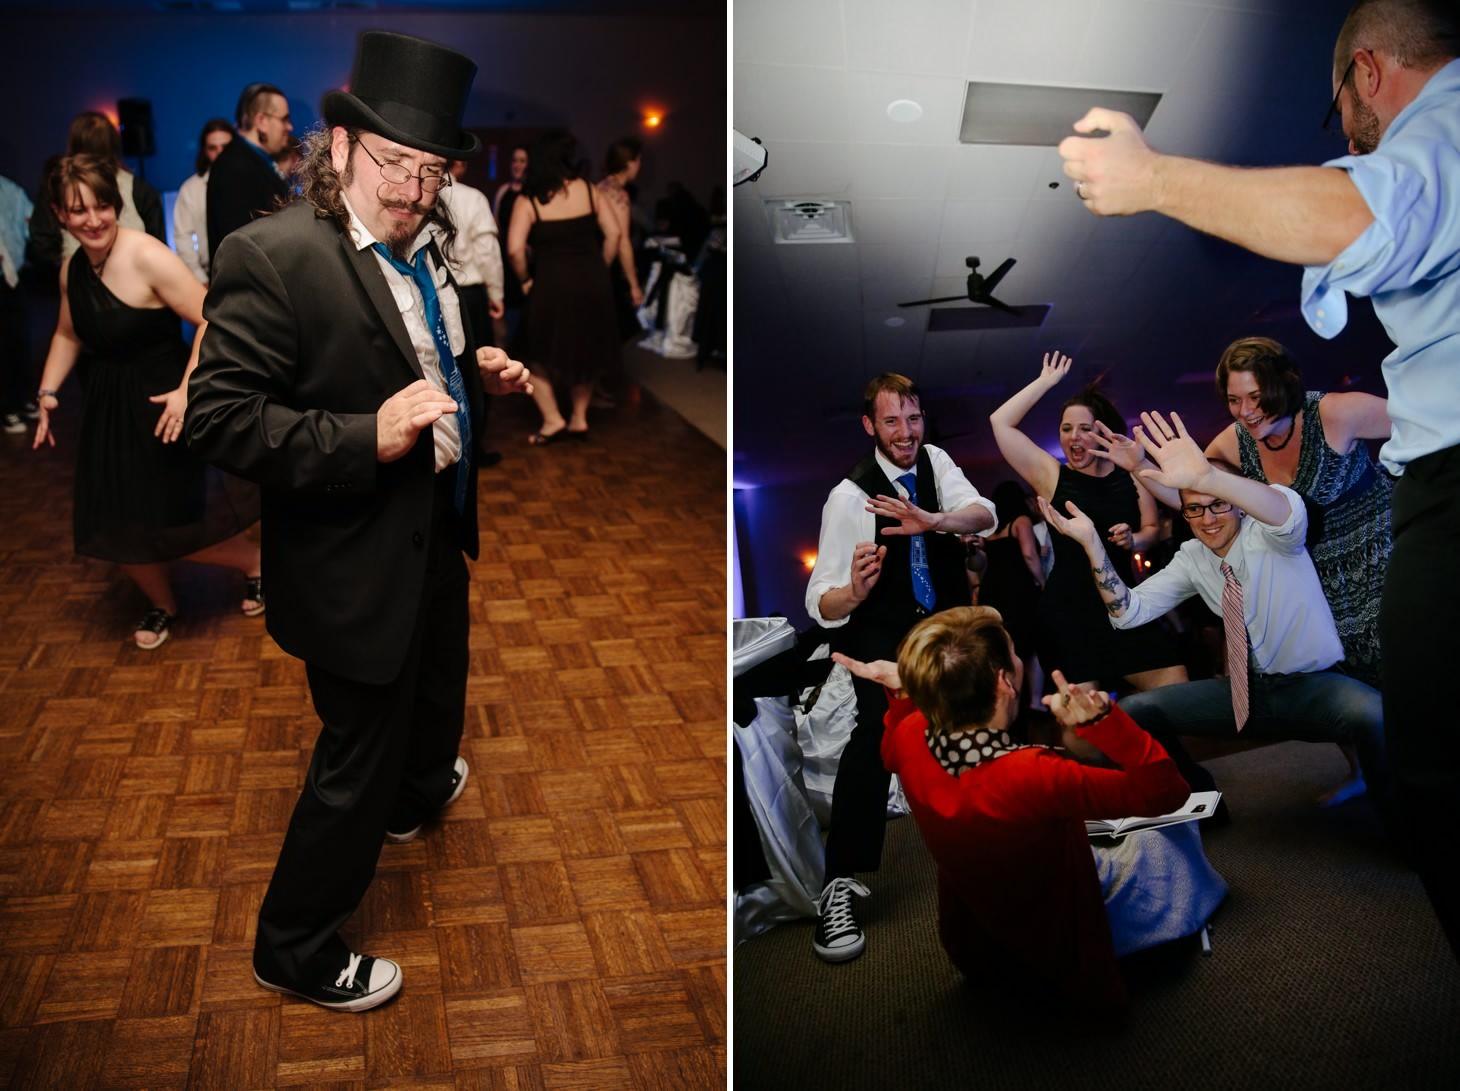 066-nyc-wedding-photographer-nj-nerdy-dr-who-firehouse-wedding-smitten-chickens.jpg